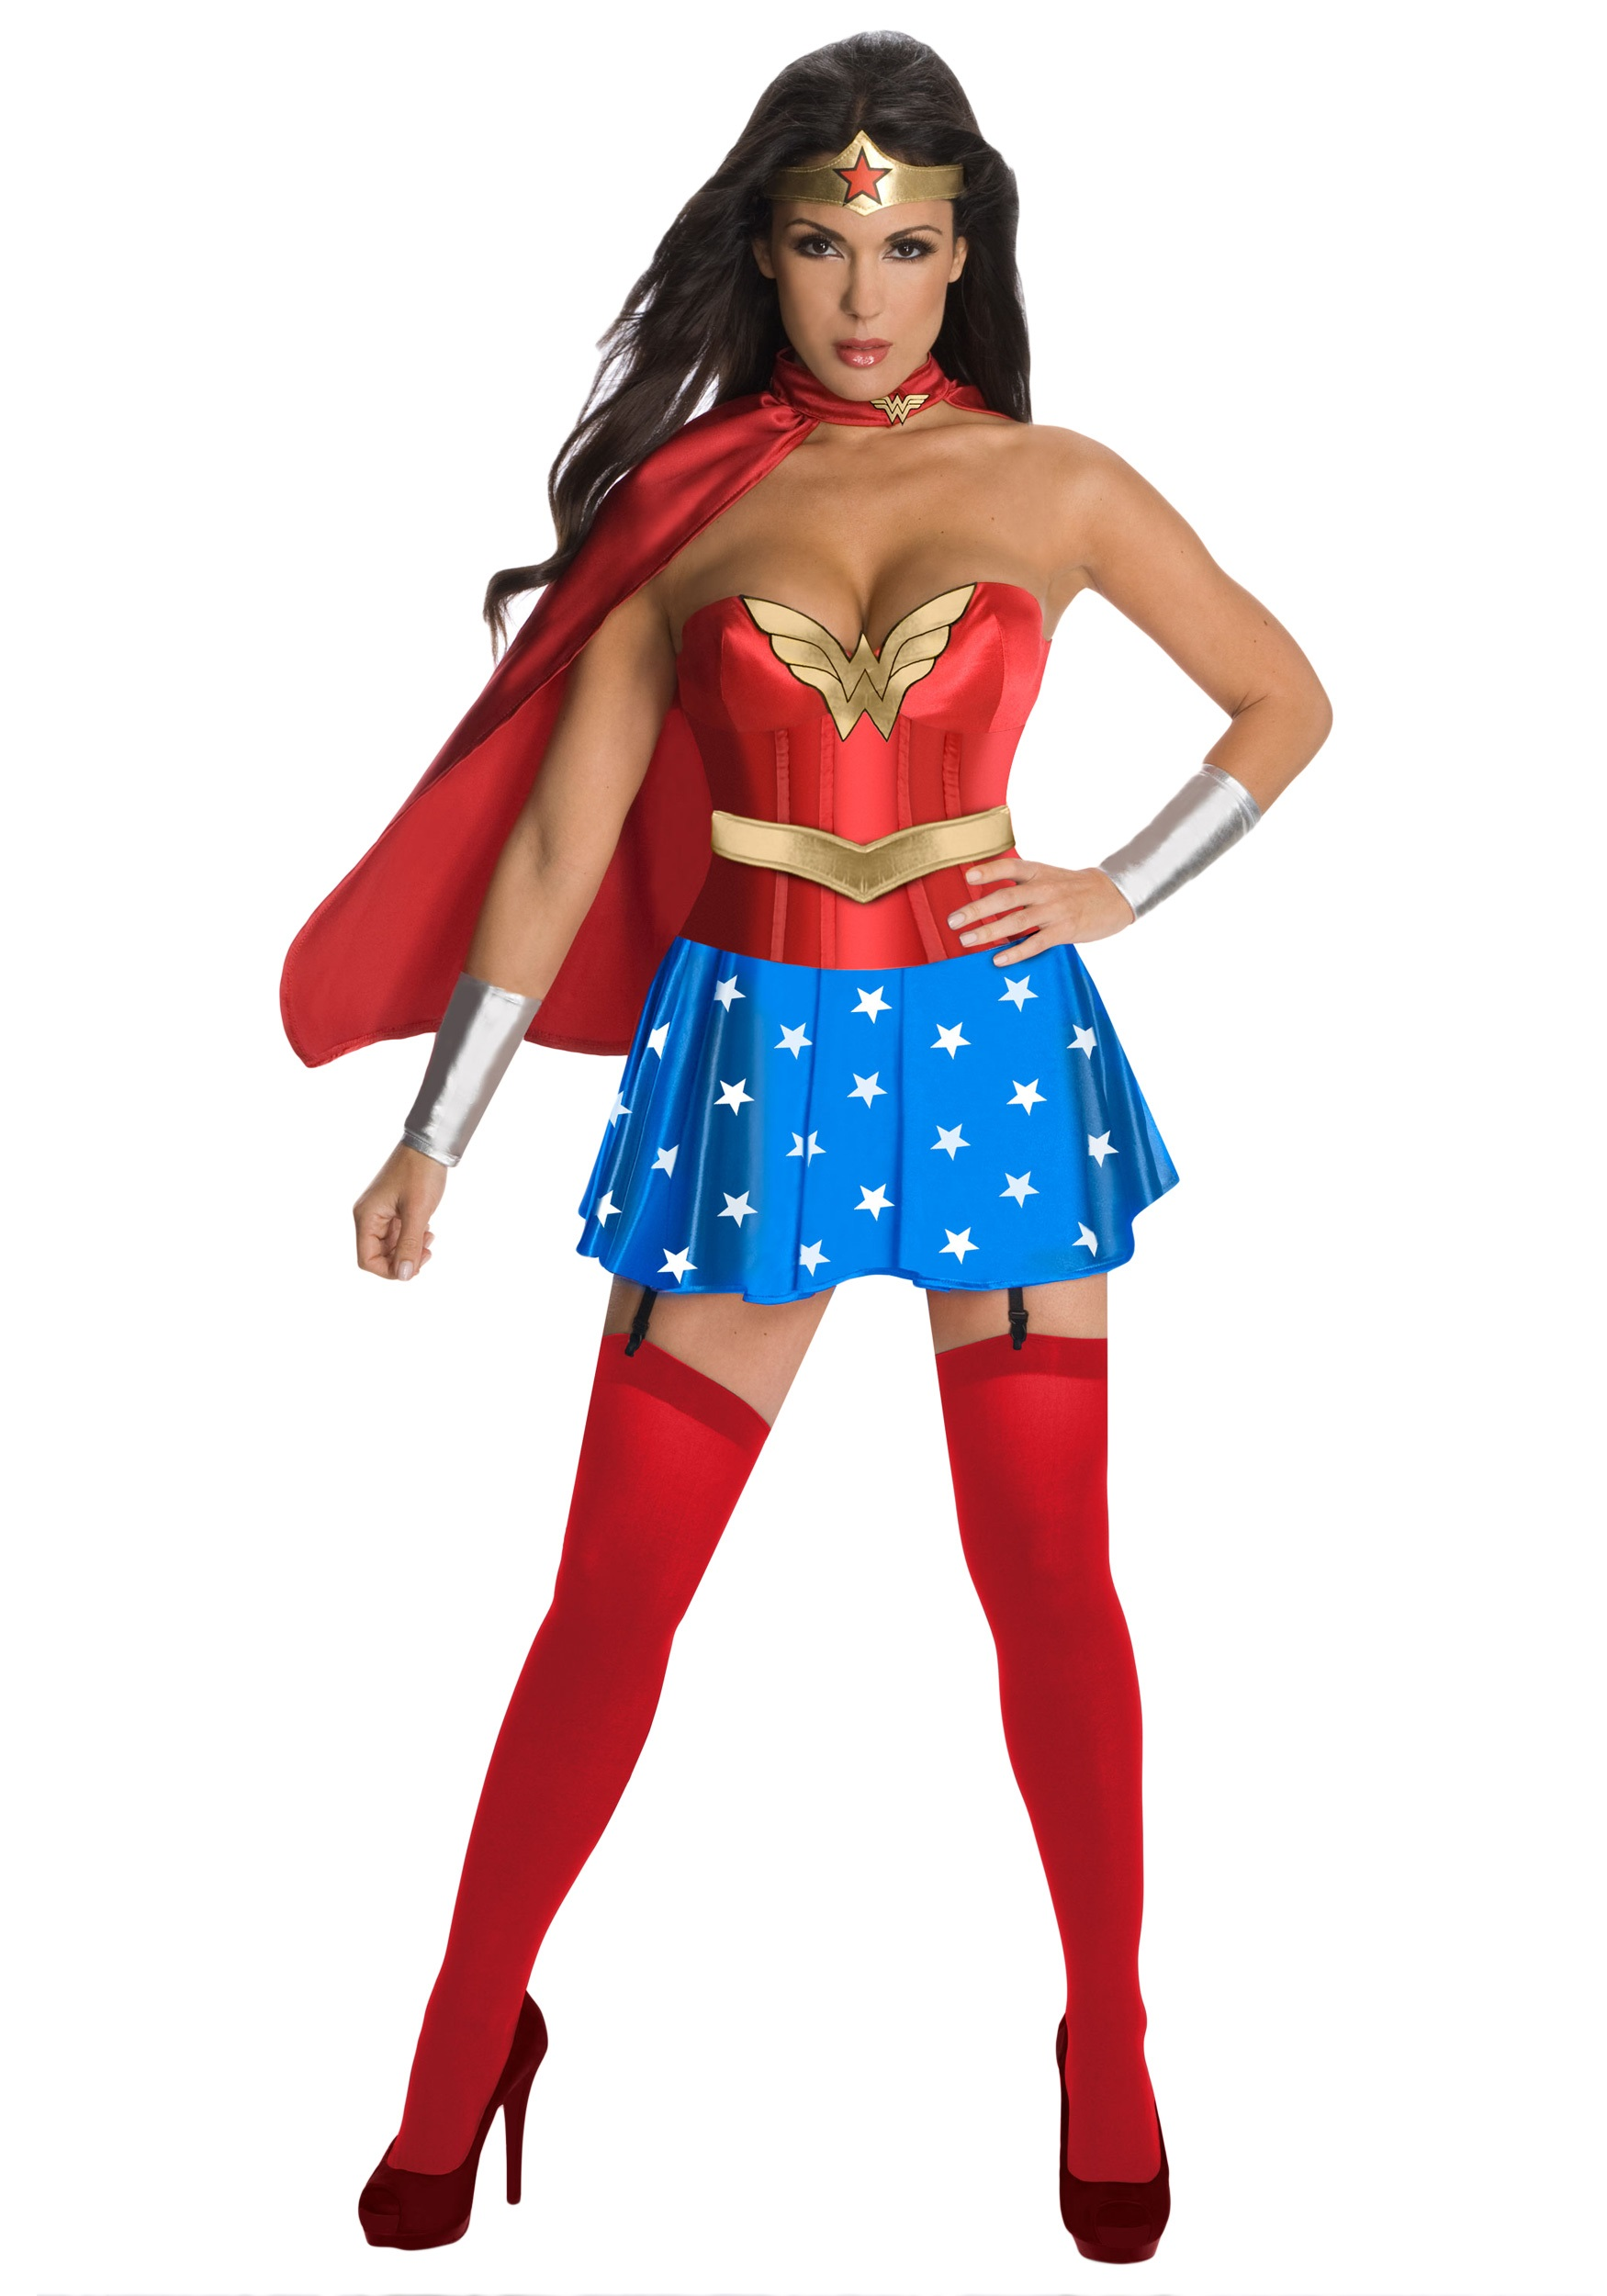 Woman corset clipart royalty free stock Wonder Woman Corset | Clipart Panda - Free Clipart Images royalty free stock